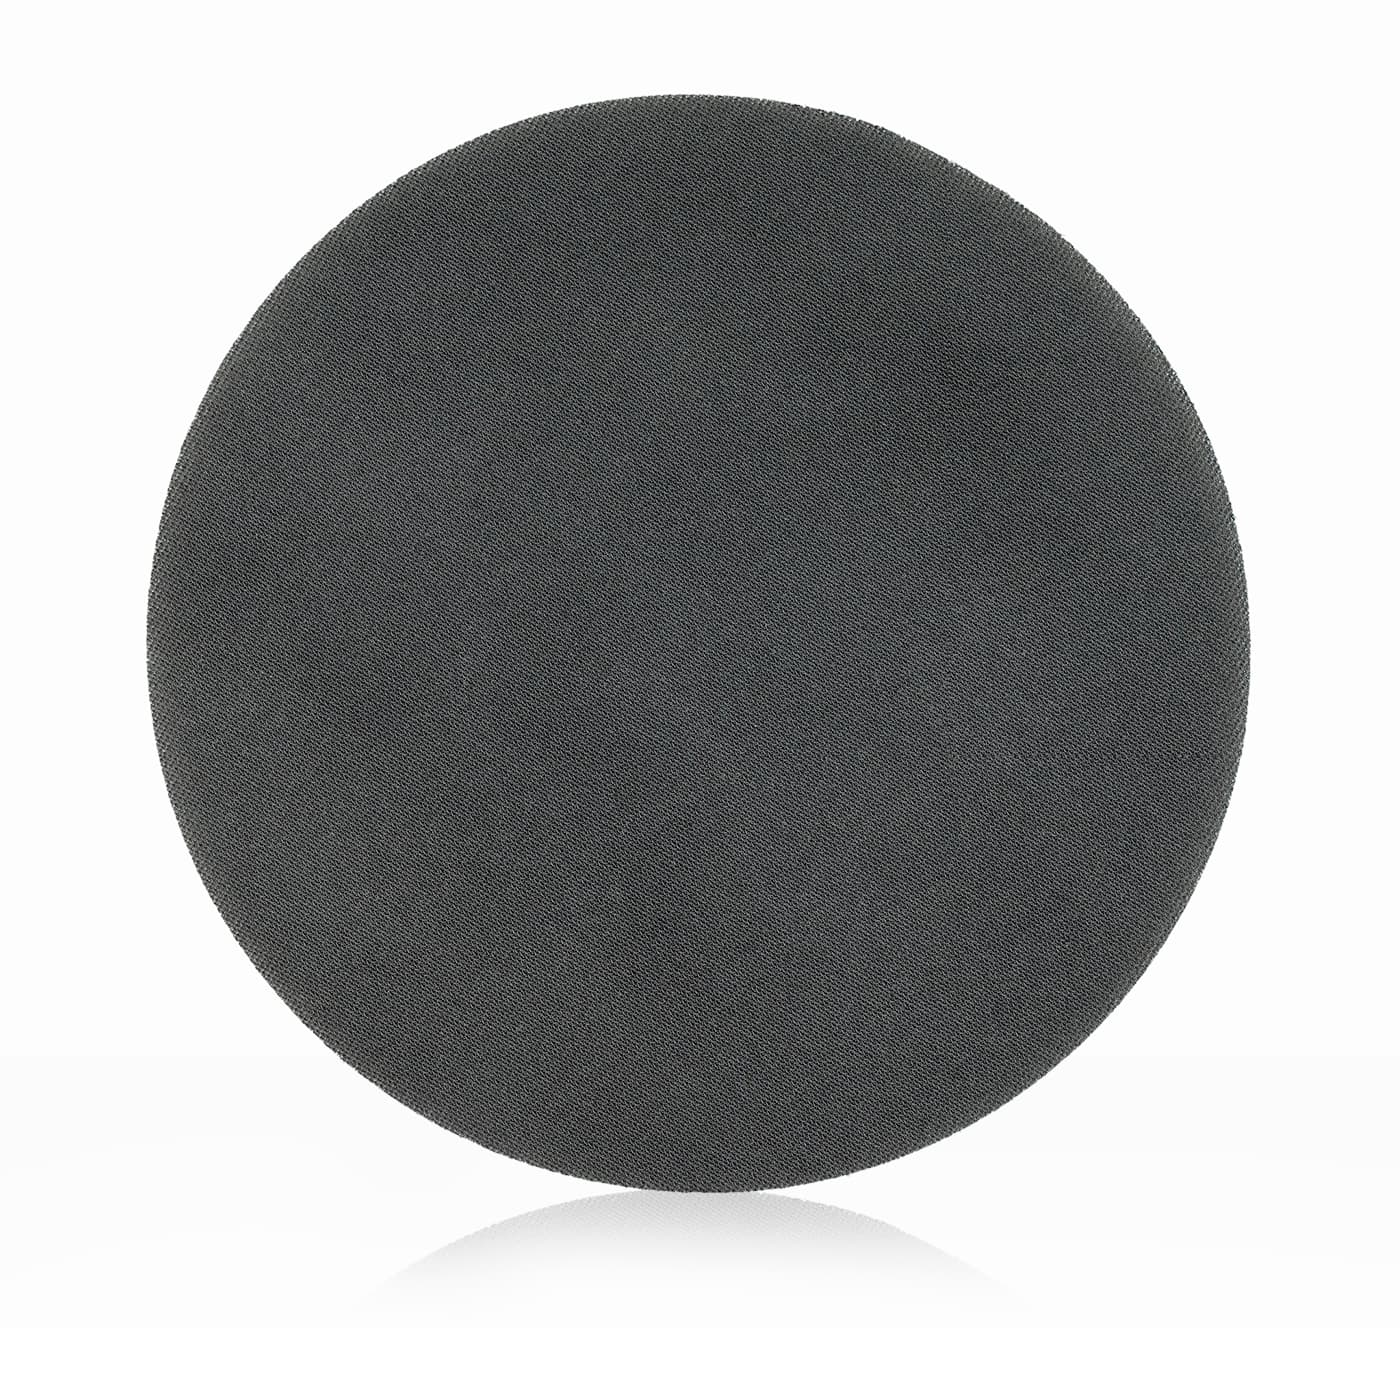 922 mat velour discs